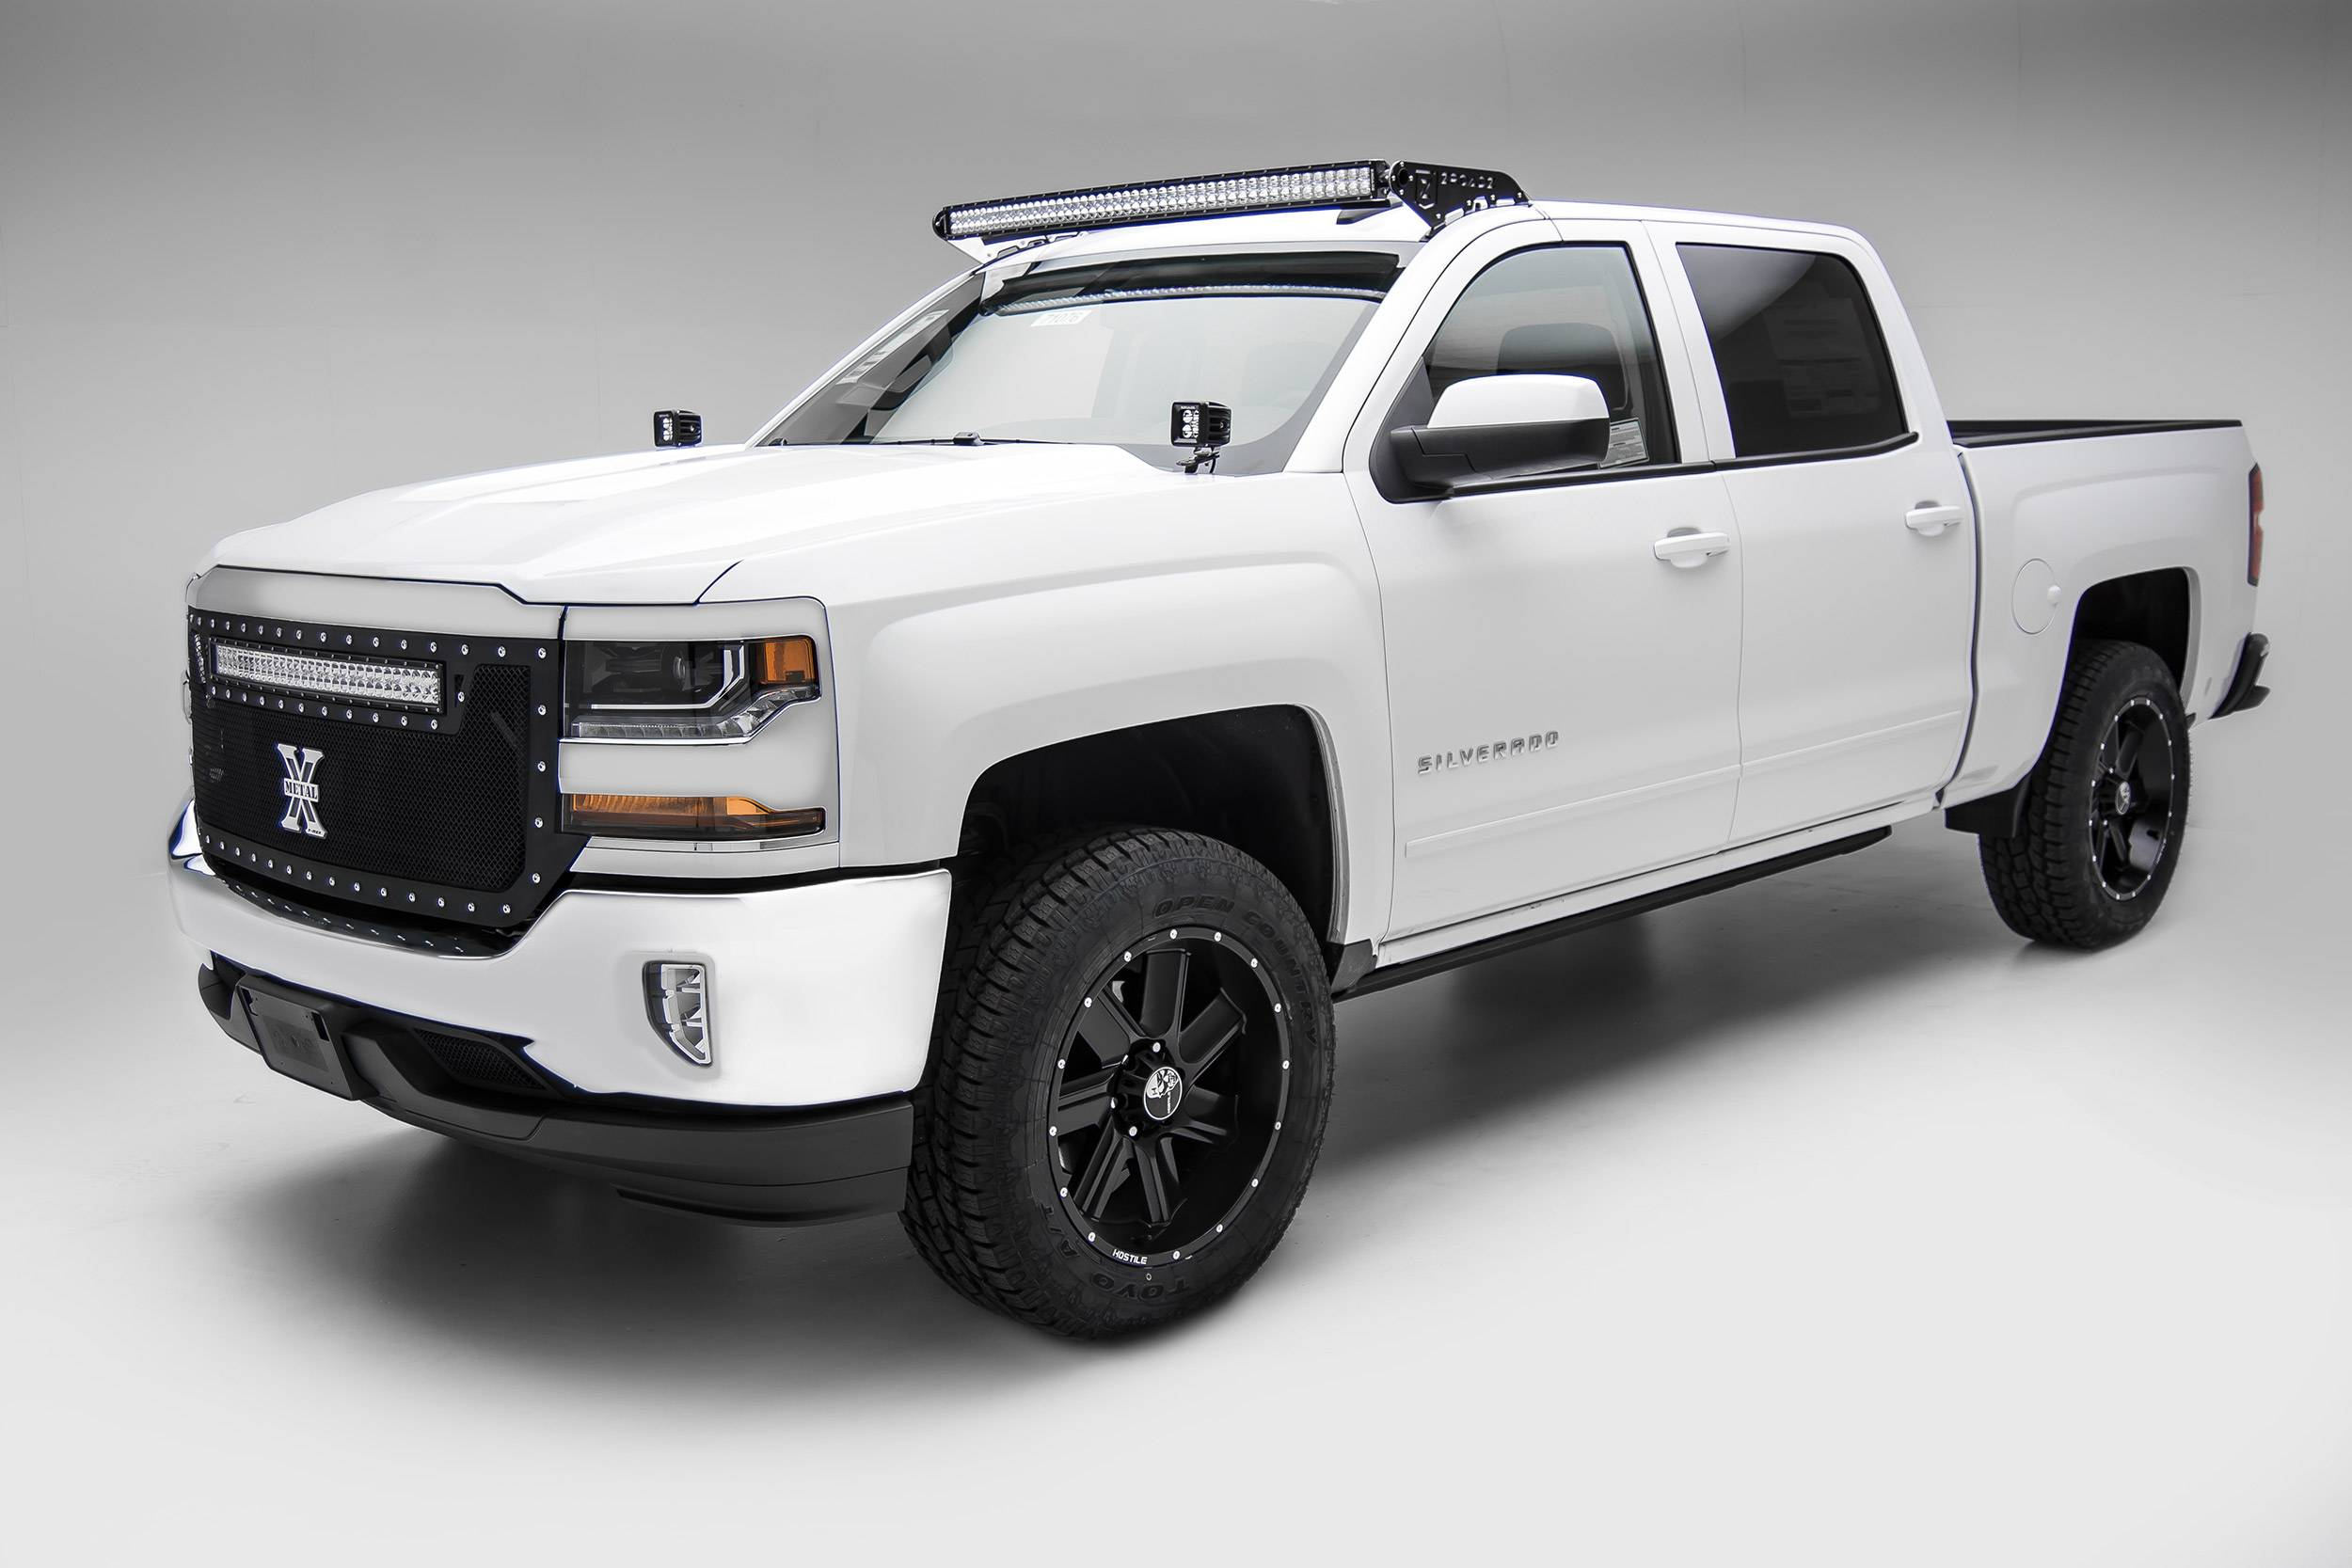 Silverado Sierra Front Roof Led Bracket To Mount 1 50 Inch Curved Led Light Bar Pn Z332081